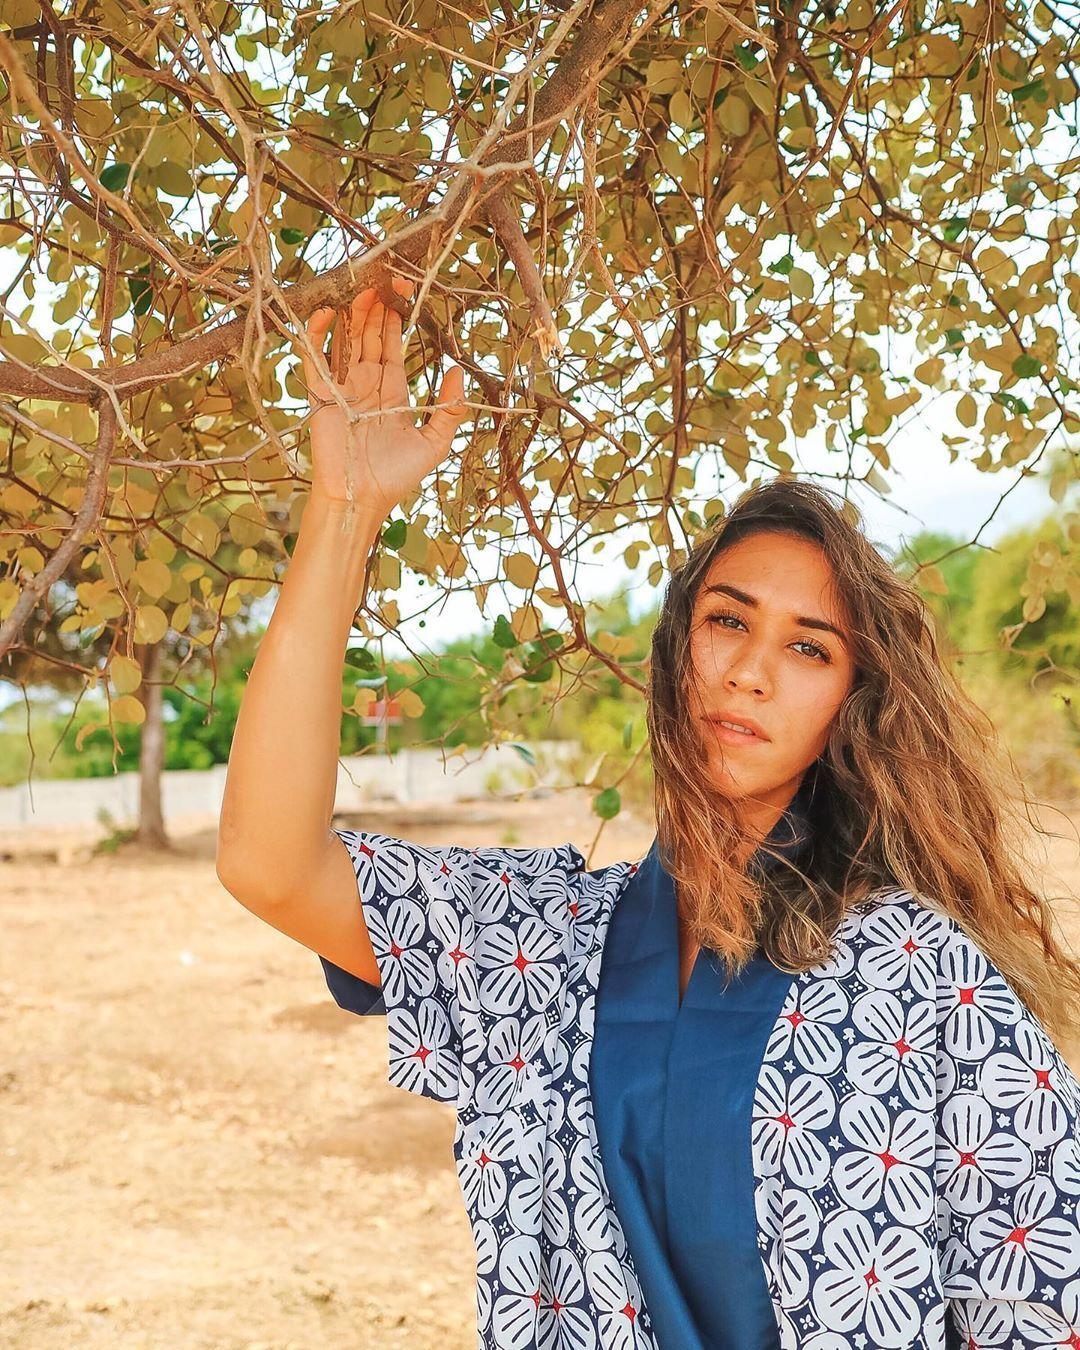 Siap-siap Jatuh Cinta! Ini 7 Artis Cantik Berdarah Bali